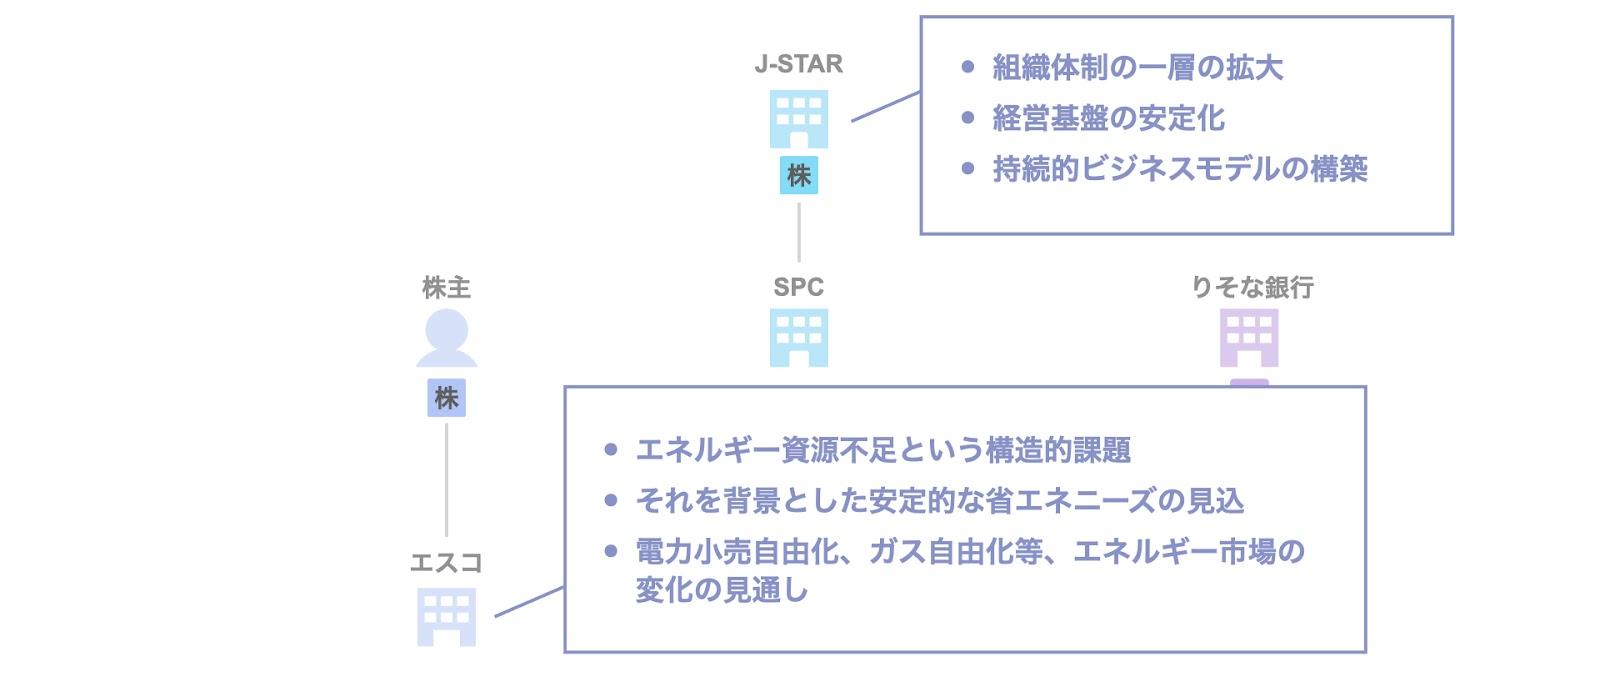 J-STARによるエスコのExit 目的・背景